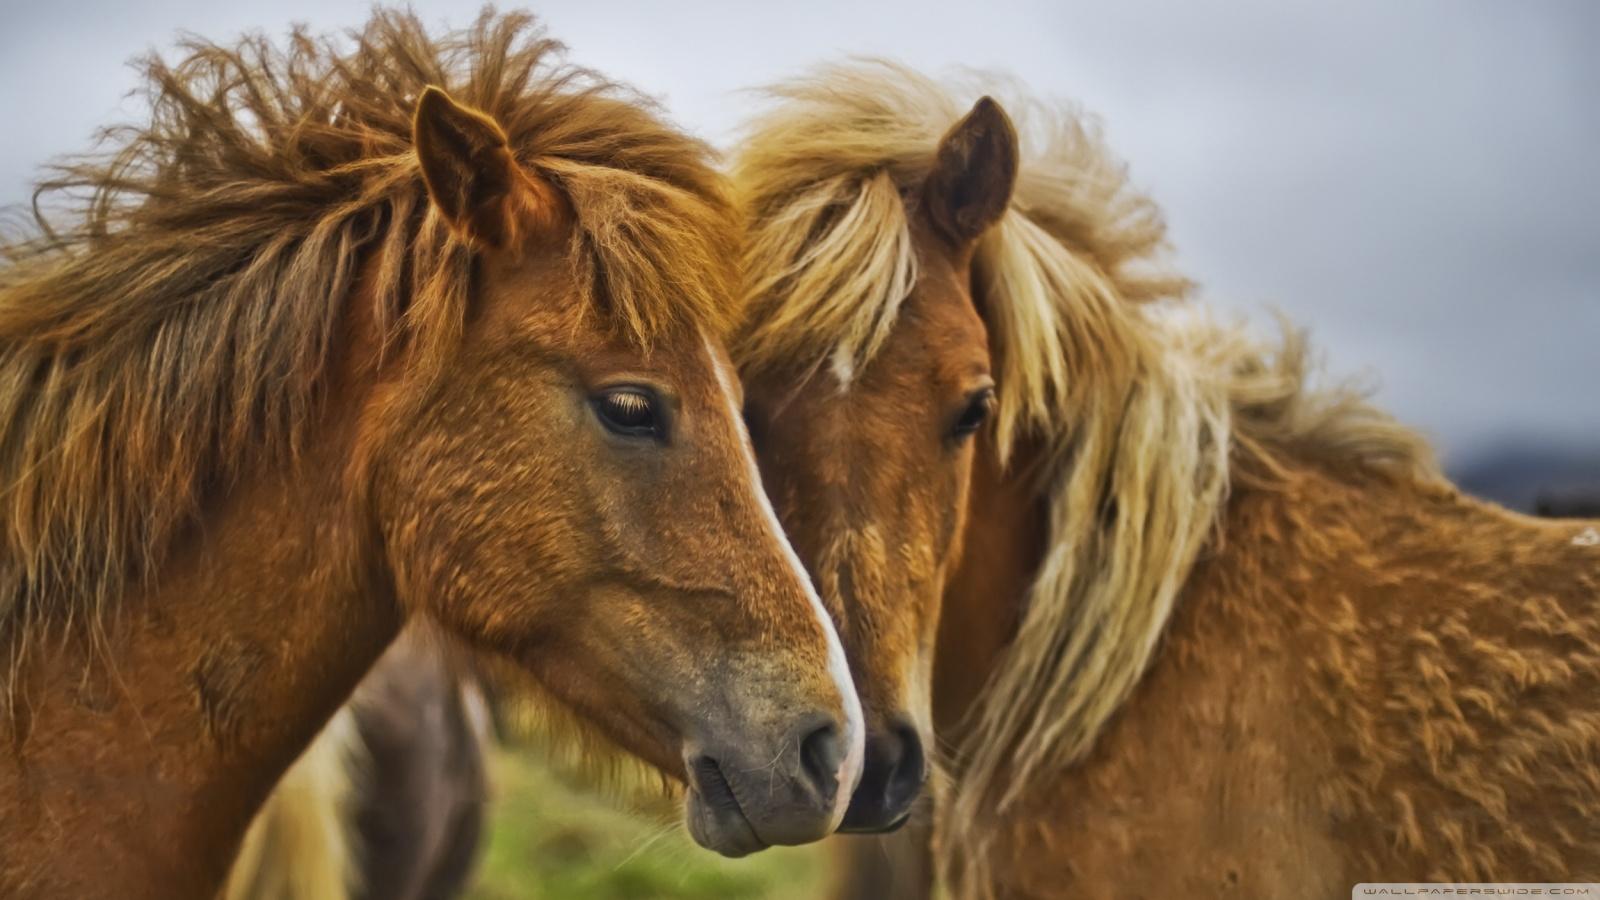 Horses HD Wallpapers Great Horses | Animal Photo - photo#18